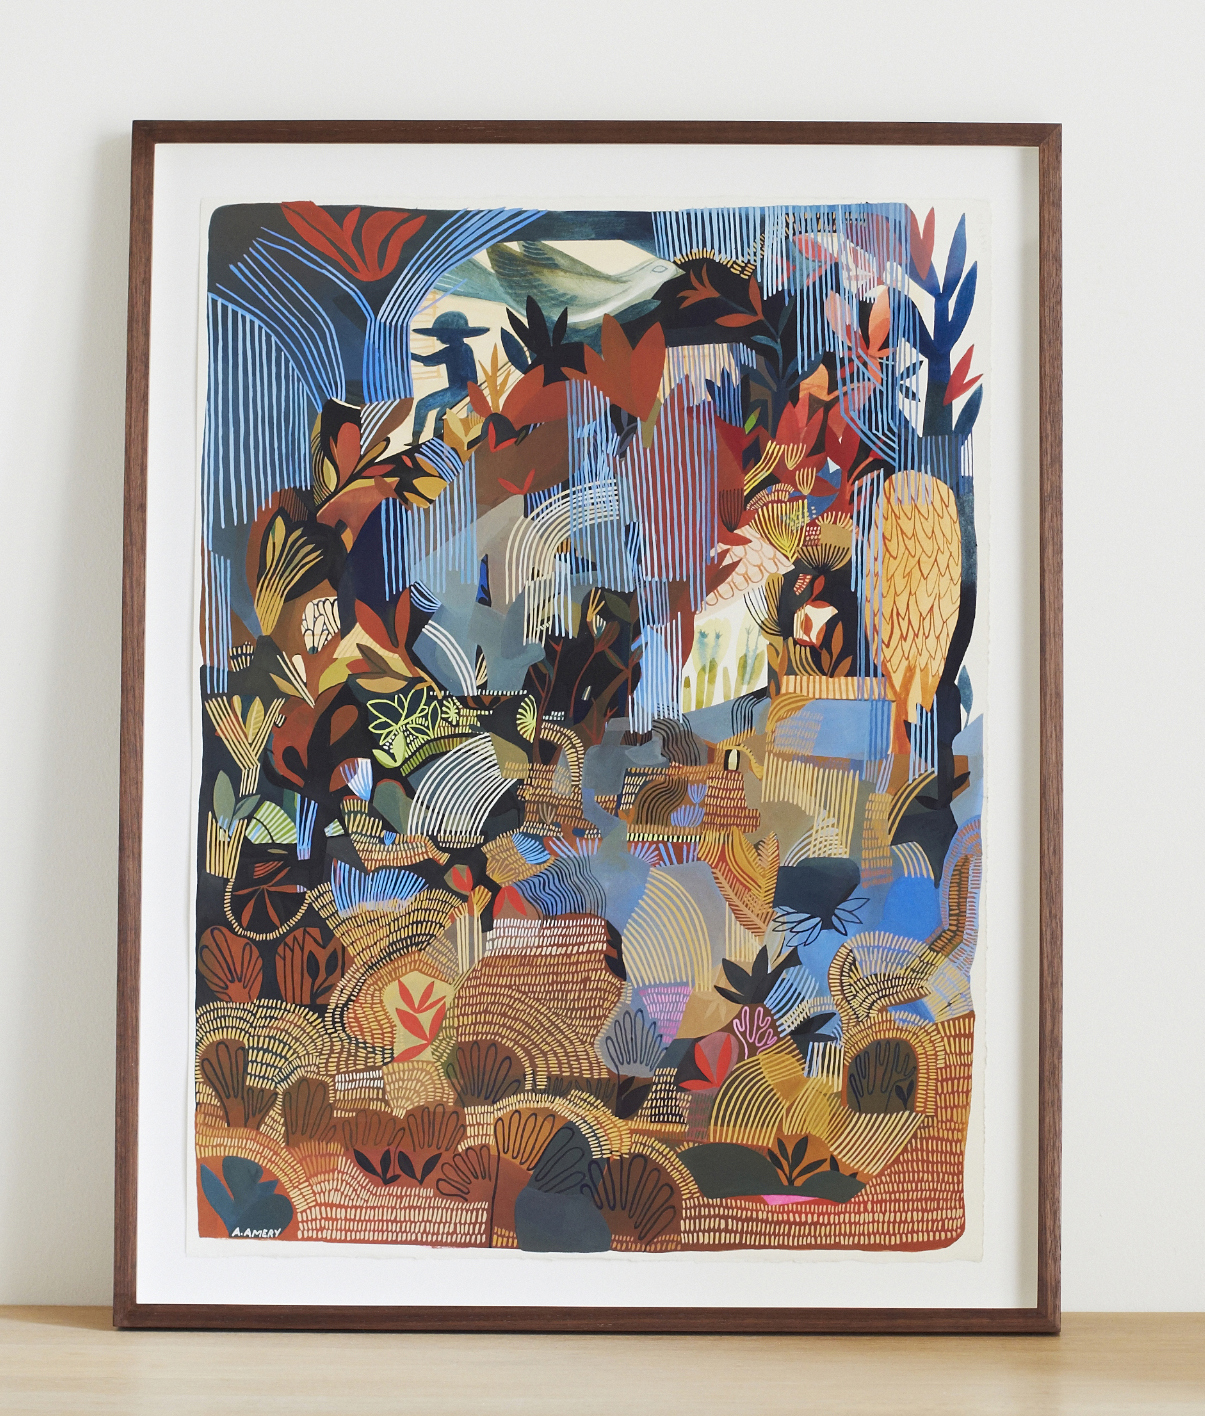 'The Gardener',Ashley Amery,2018,40 x 55 cm, Gouache on paper